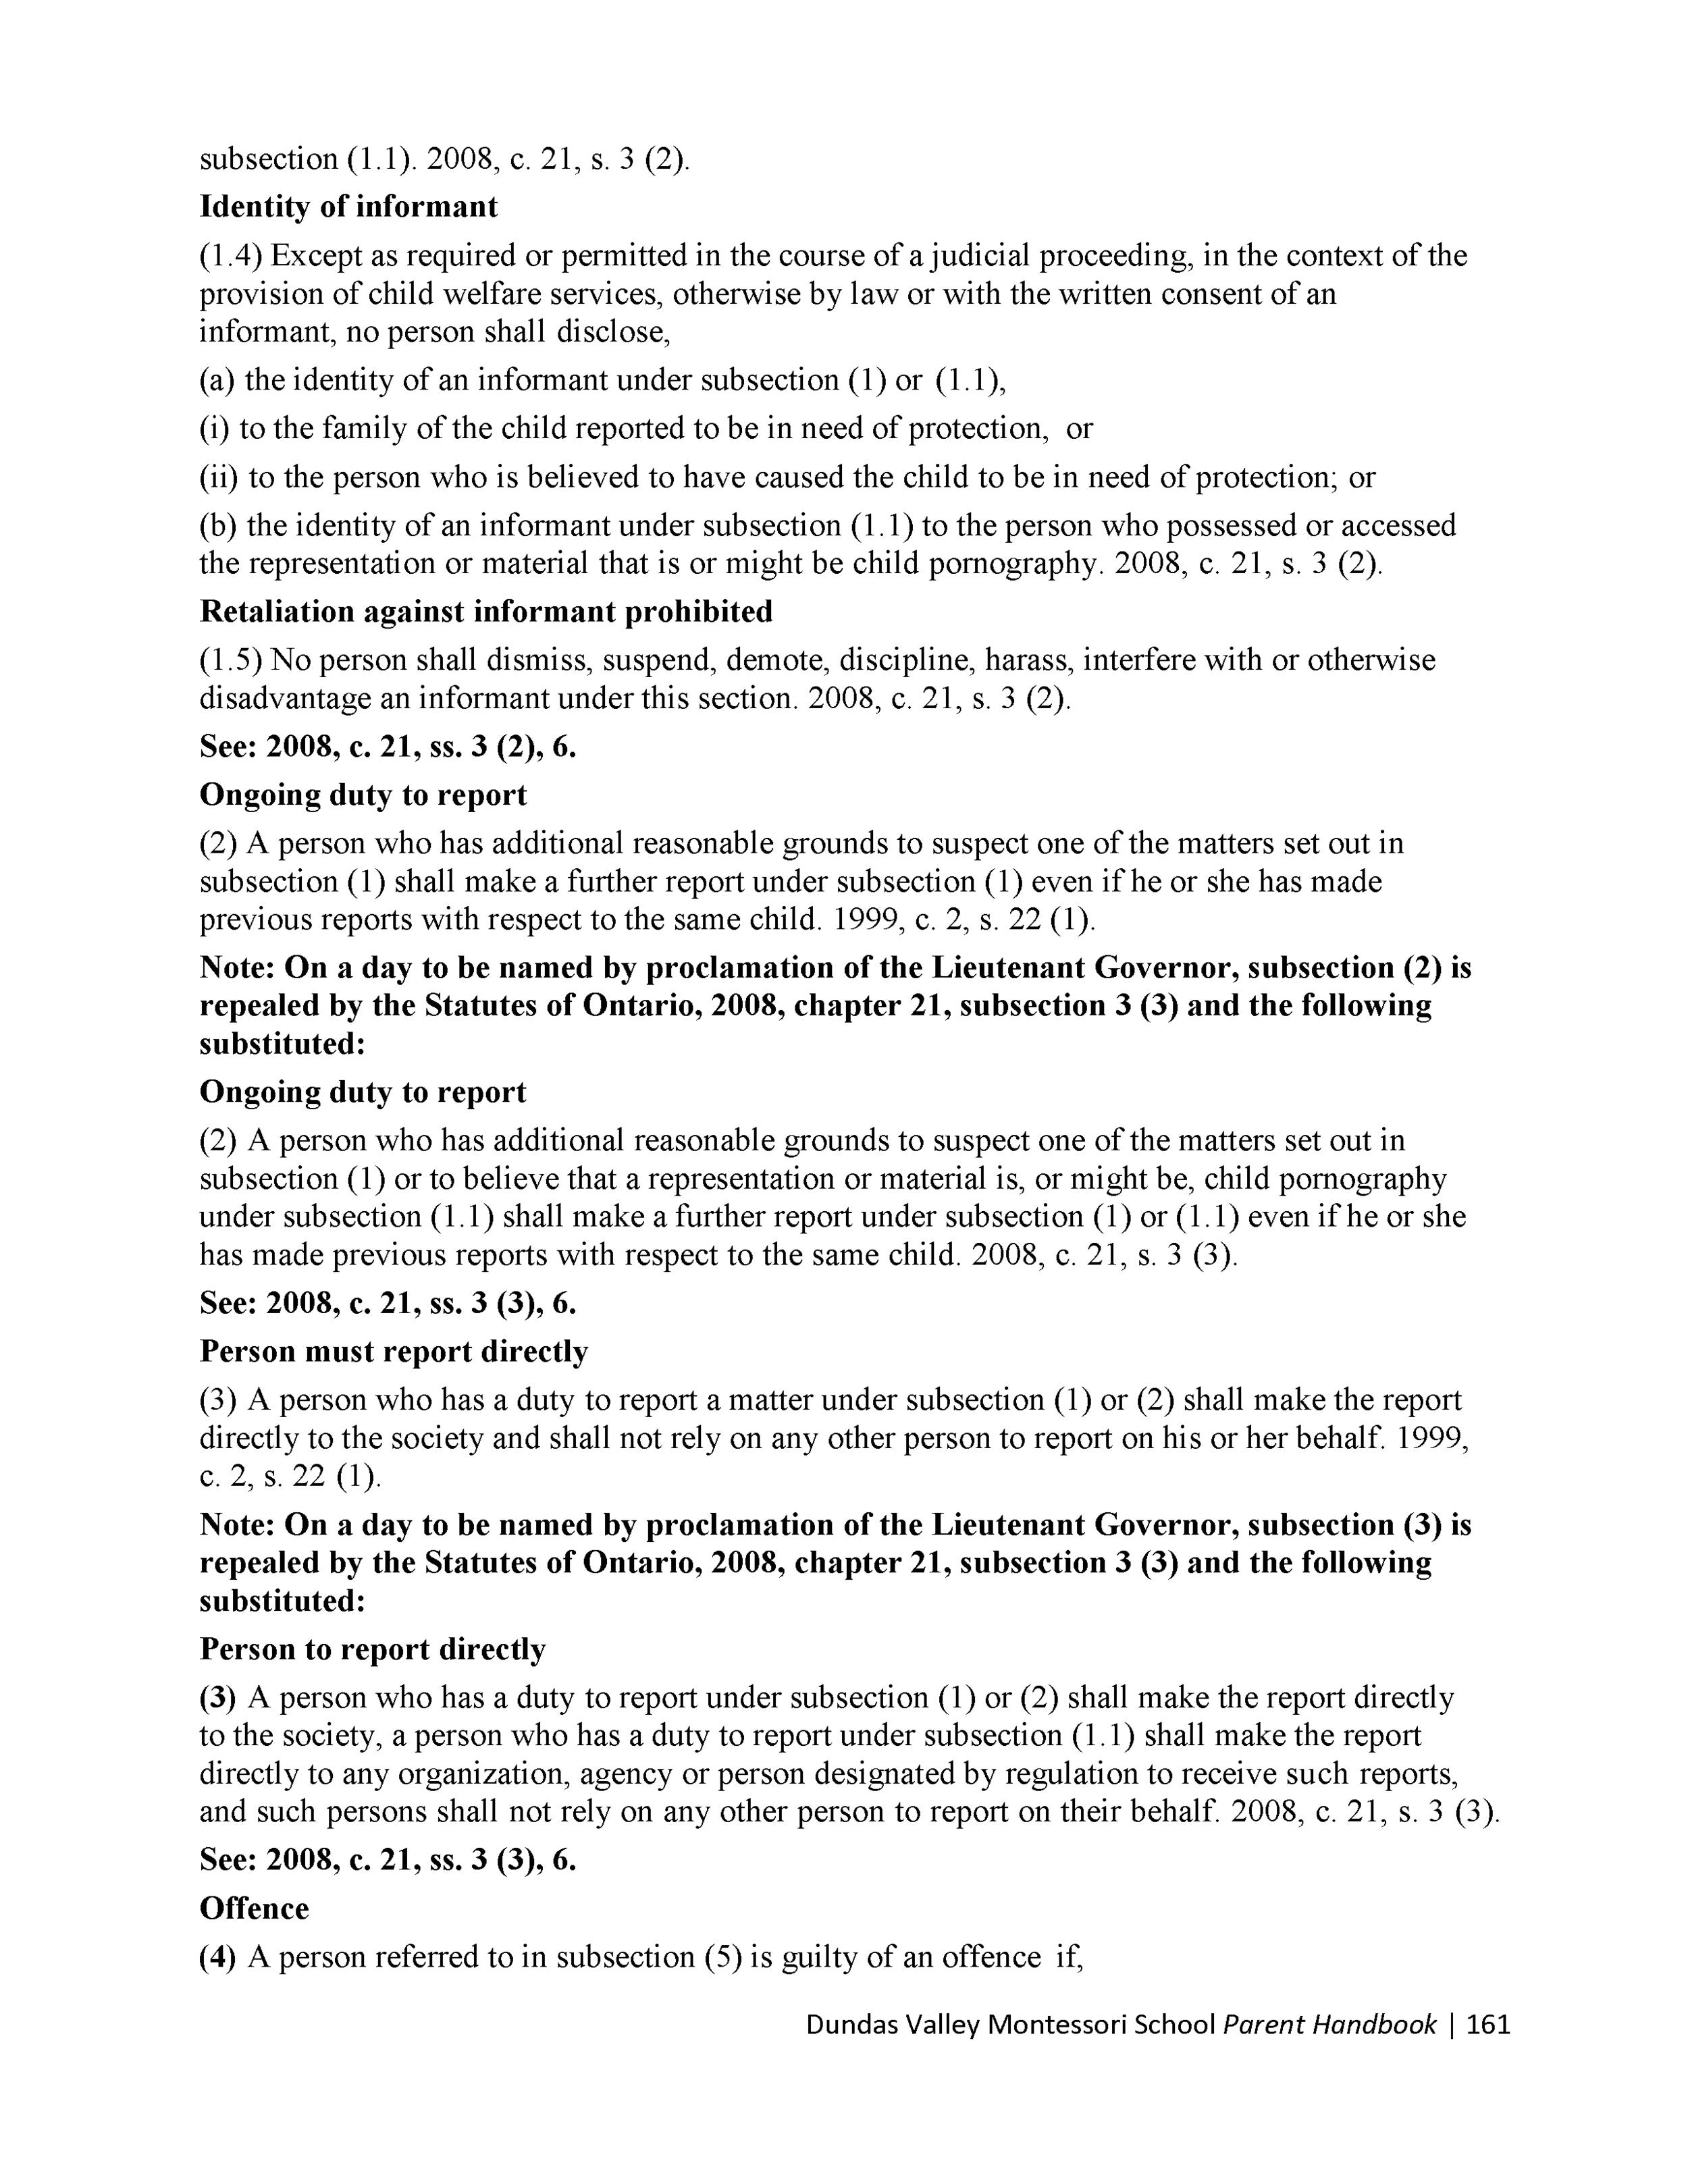 DVMS-Parent-Handbook-19-20_Page_163.png